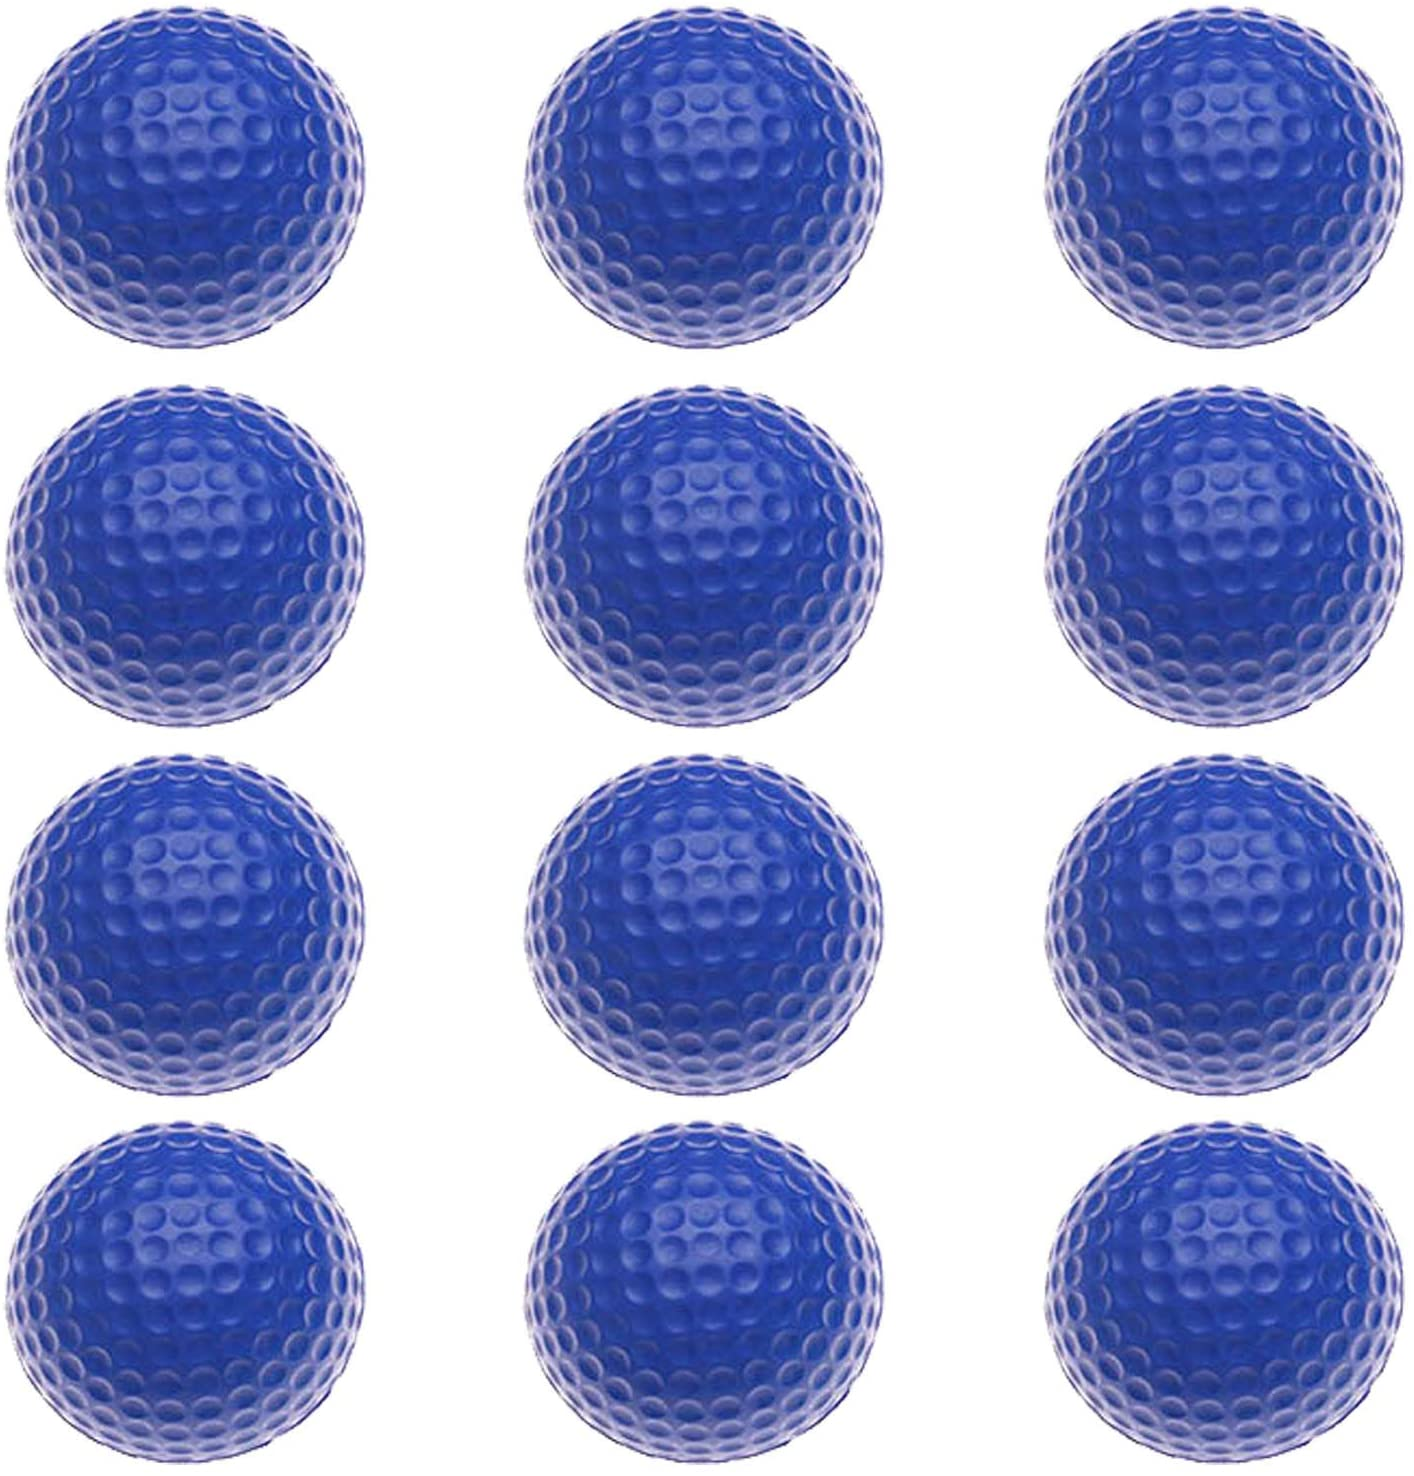 FingerTen Golf Balls Practice Foam Value 12Pcs/24Pcs, Soft Elastic Restricted Flight Indoors and Outdoors Training Aid Ball